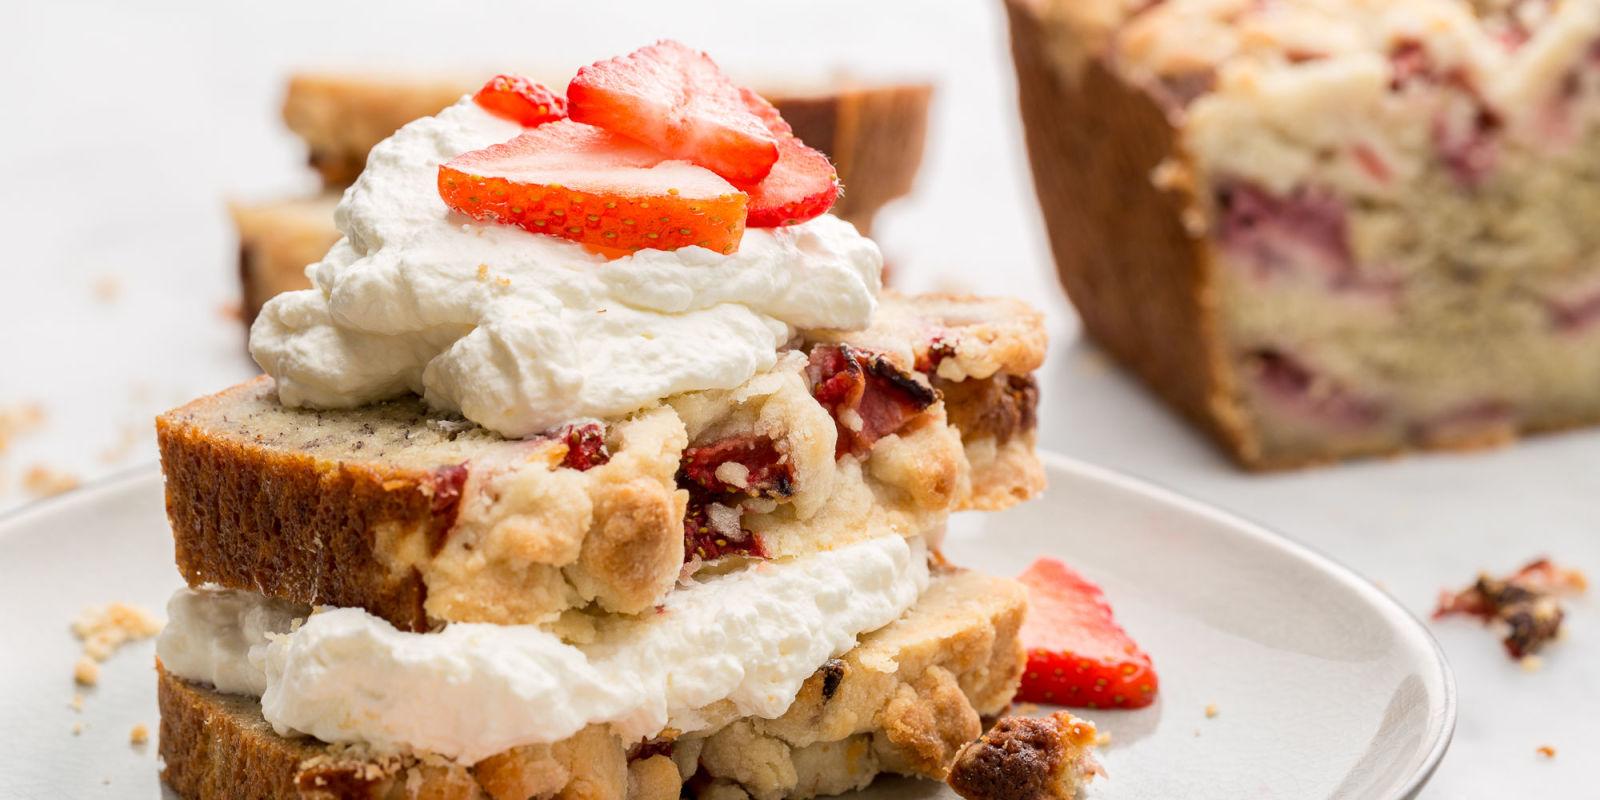 Lindsay Funston Best Strawberry Shortcake Banana Bread Recipe How To